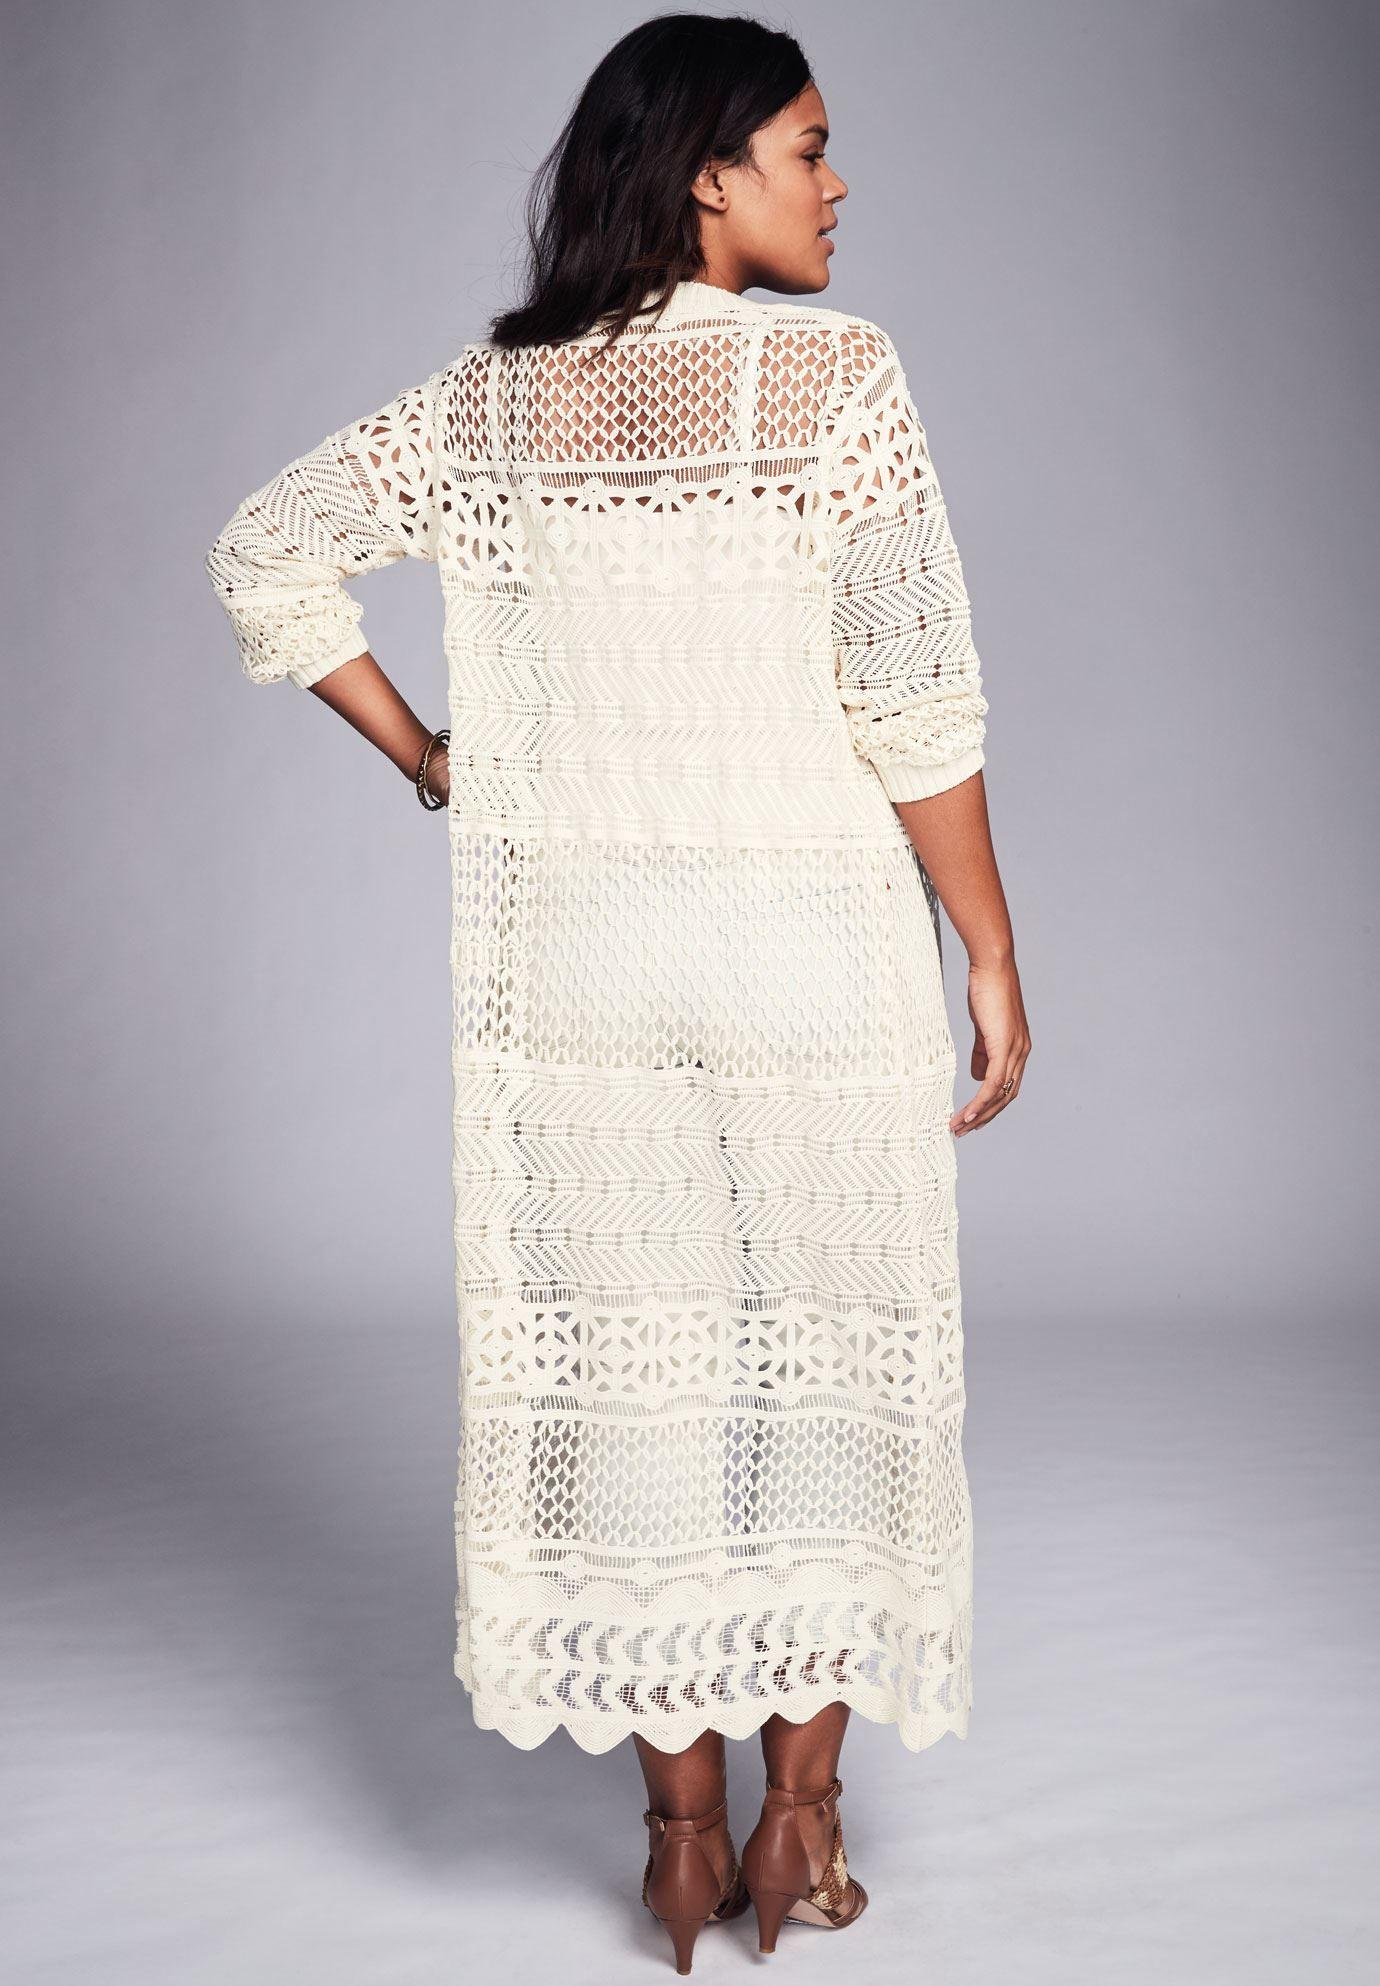 Long lace cardigan - Plus Size Long Lace Cardigan 69 99